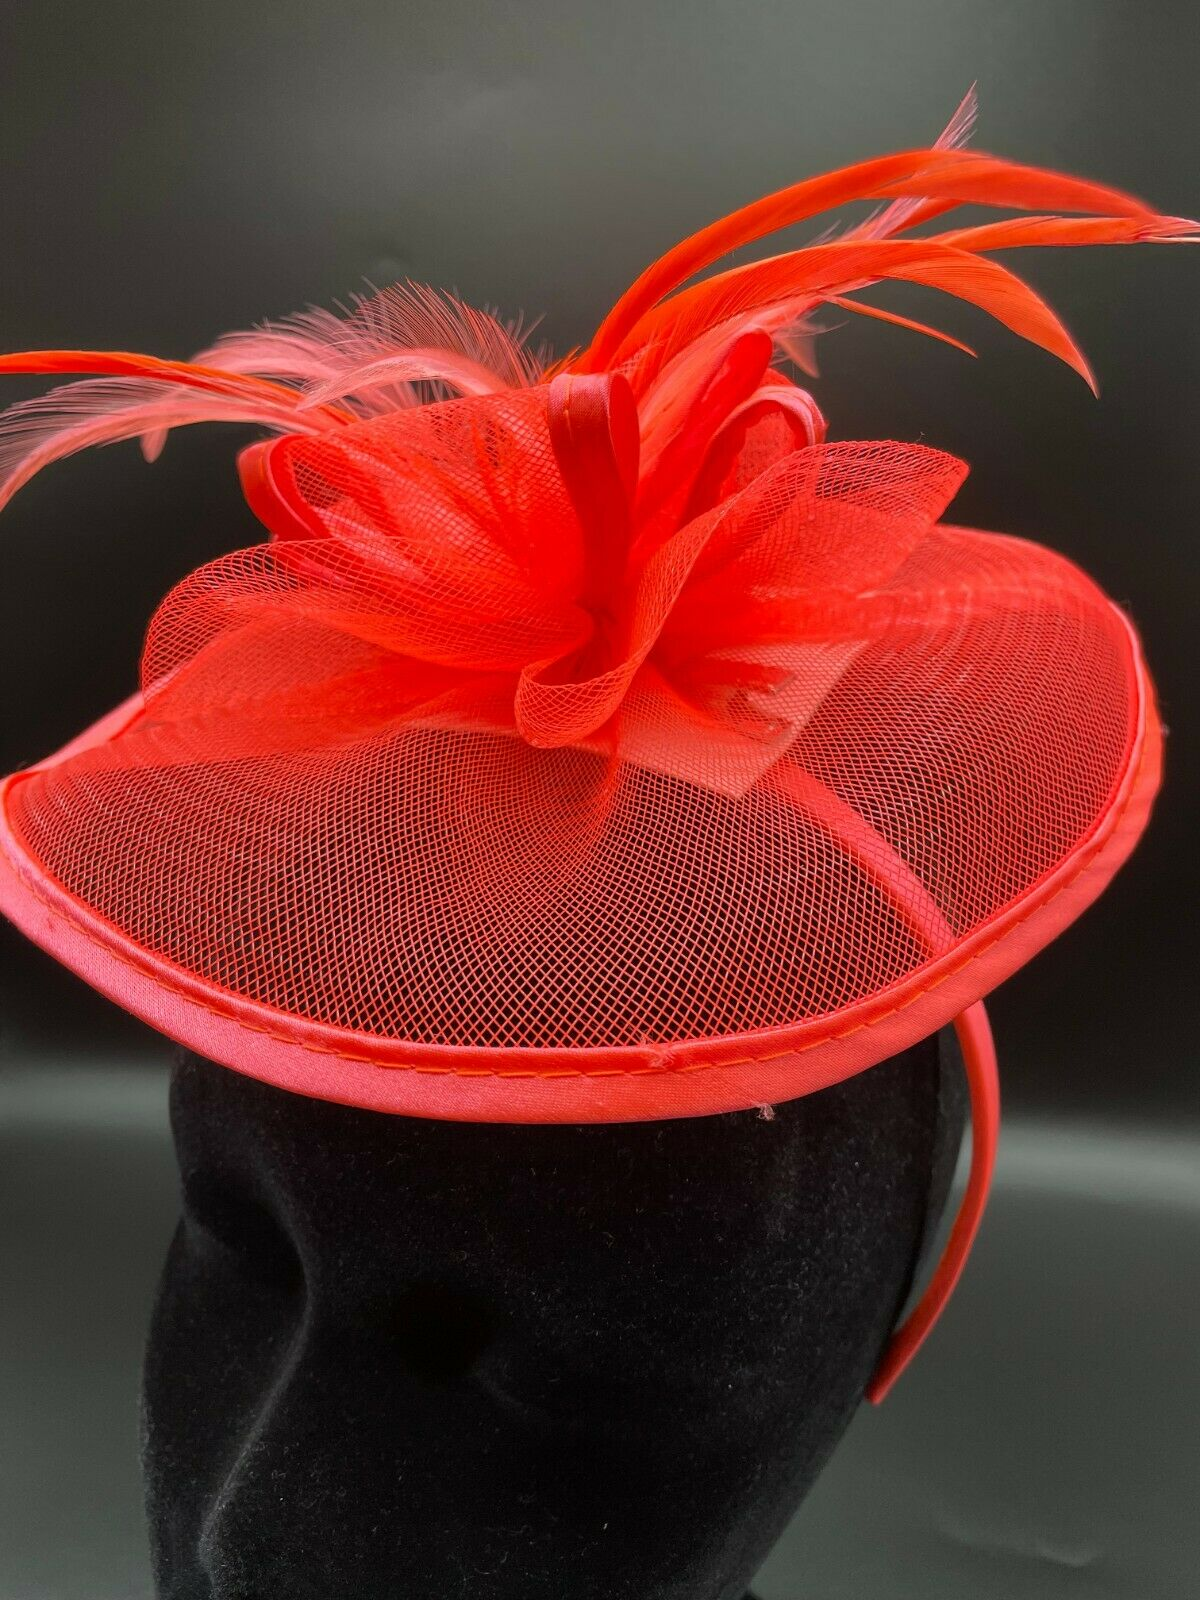 * New bright coral pink fascinator + FREE headband clip on wedding hat formal